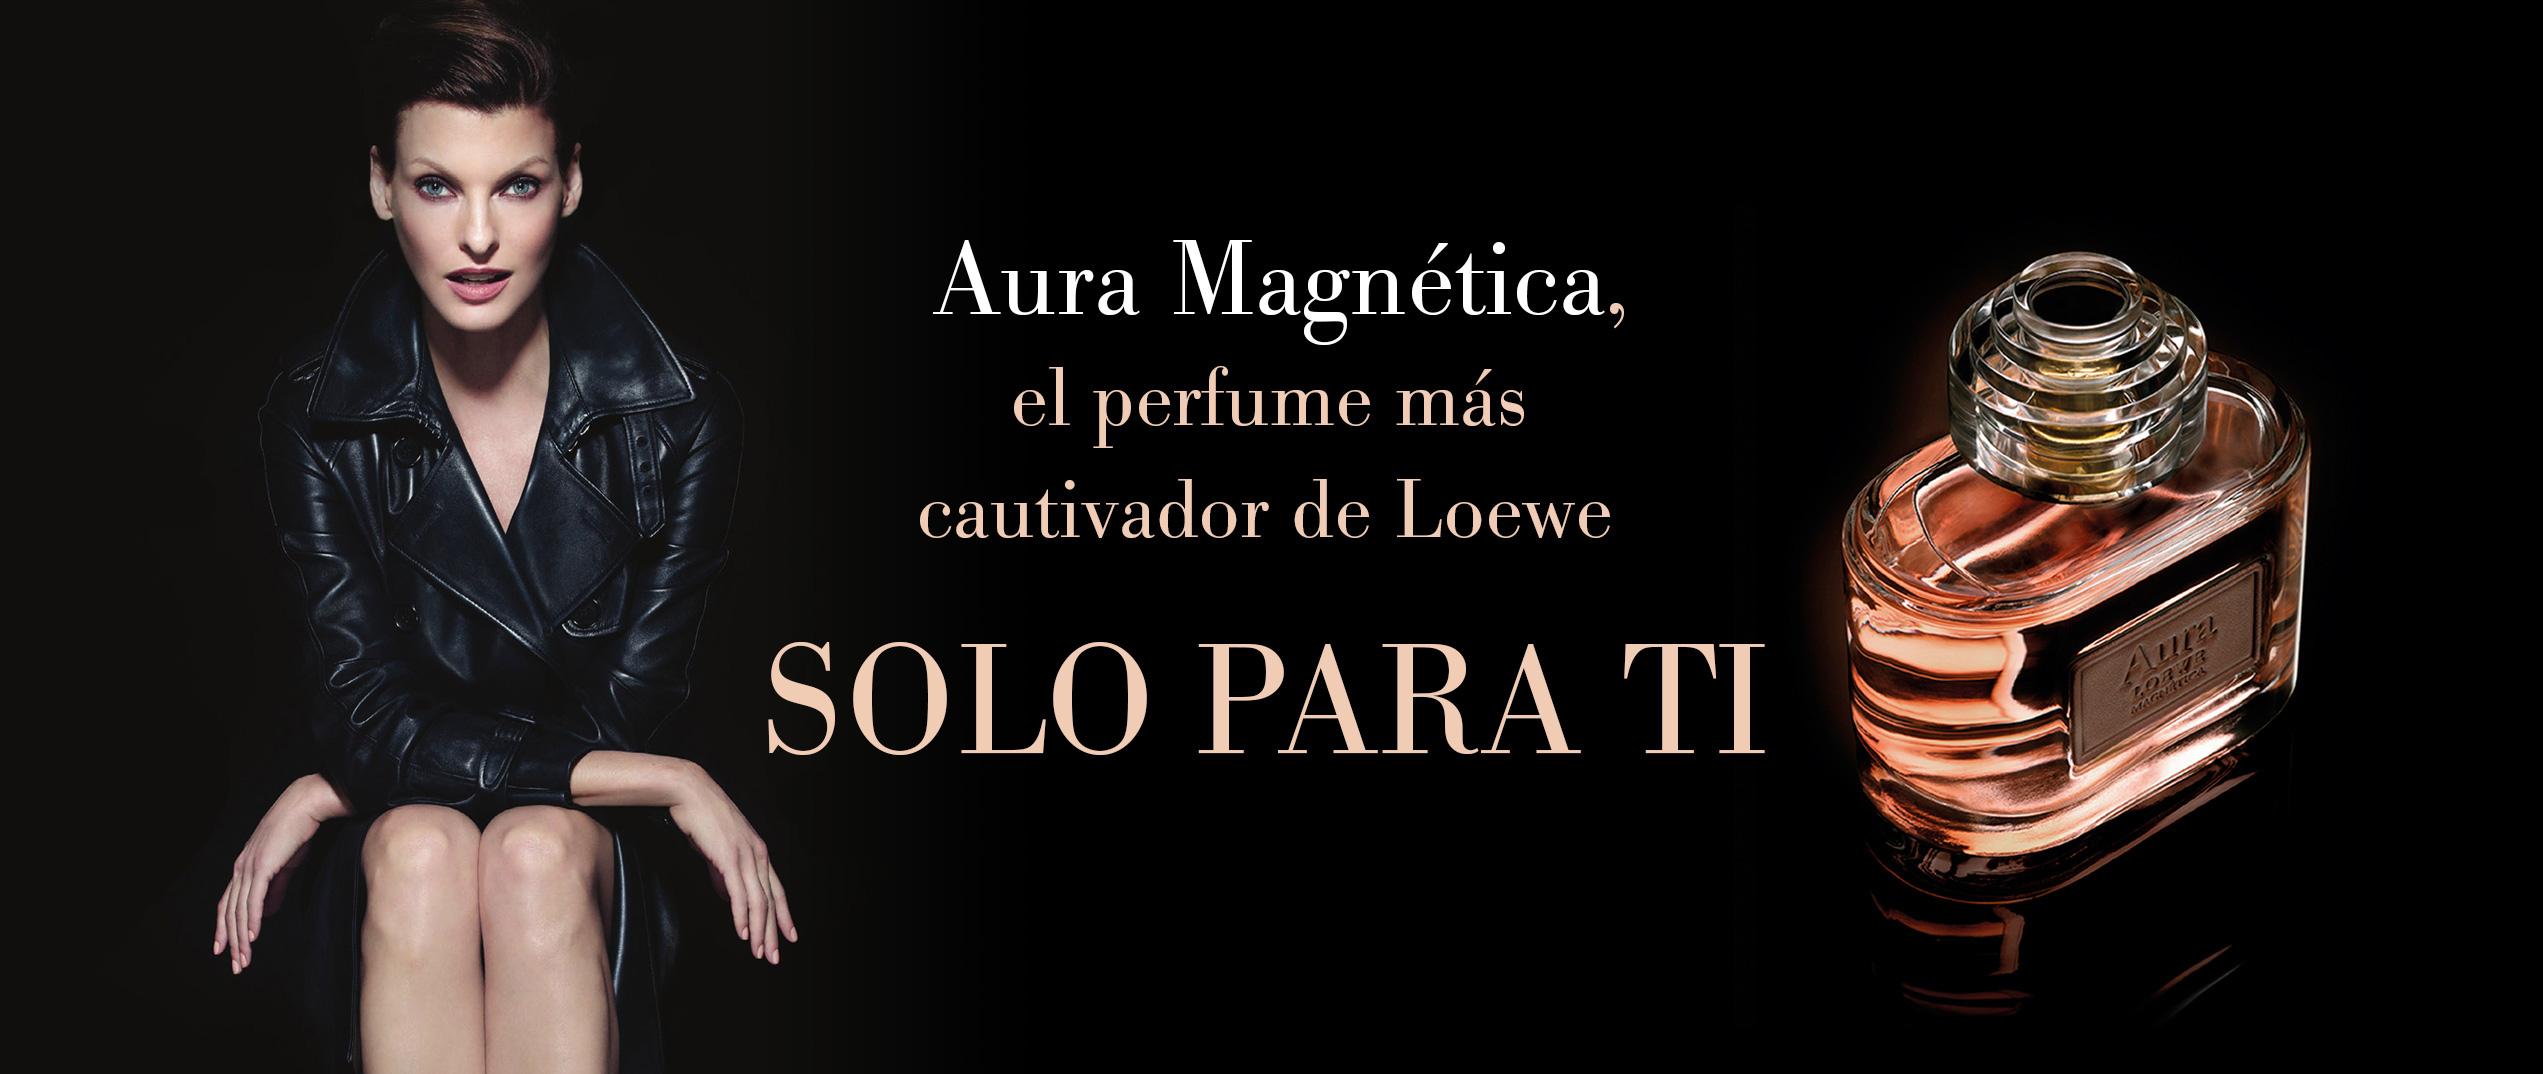 Aura Magnética, de Loewe